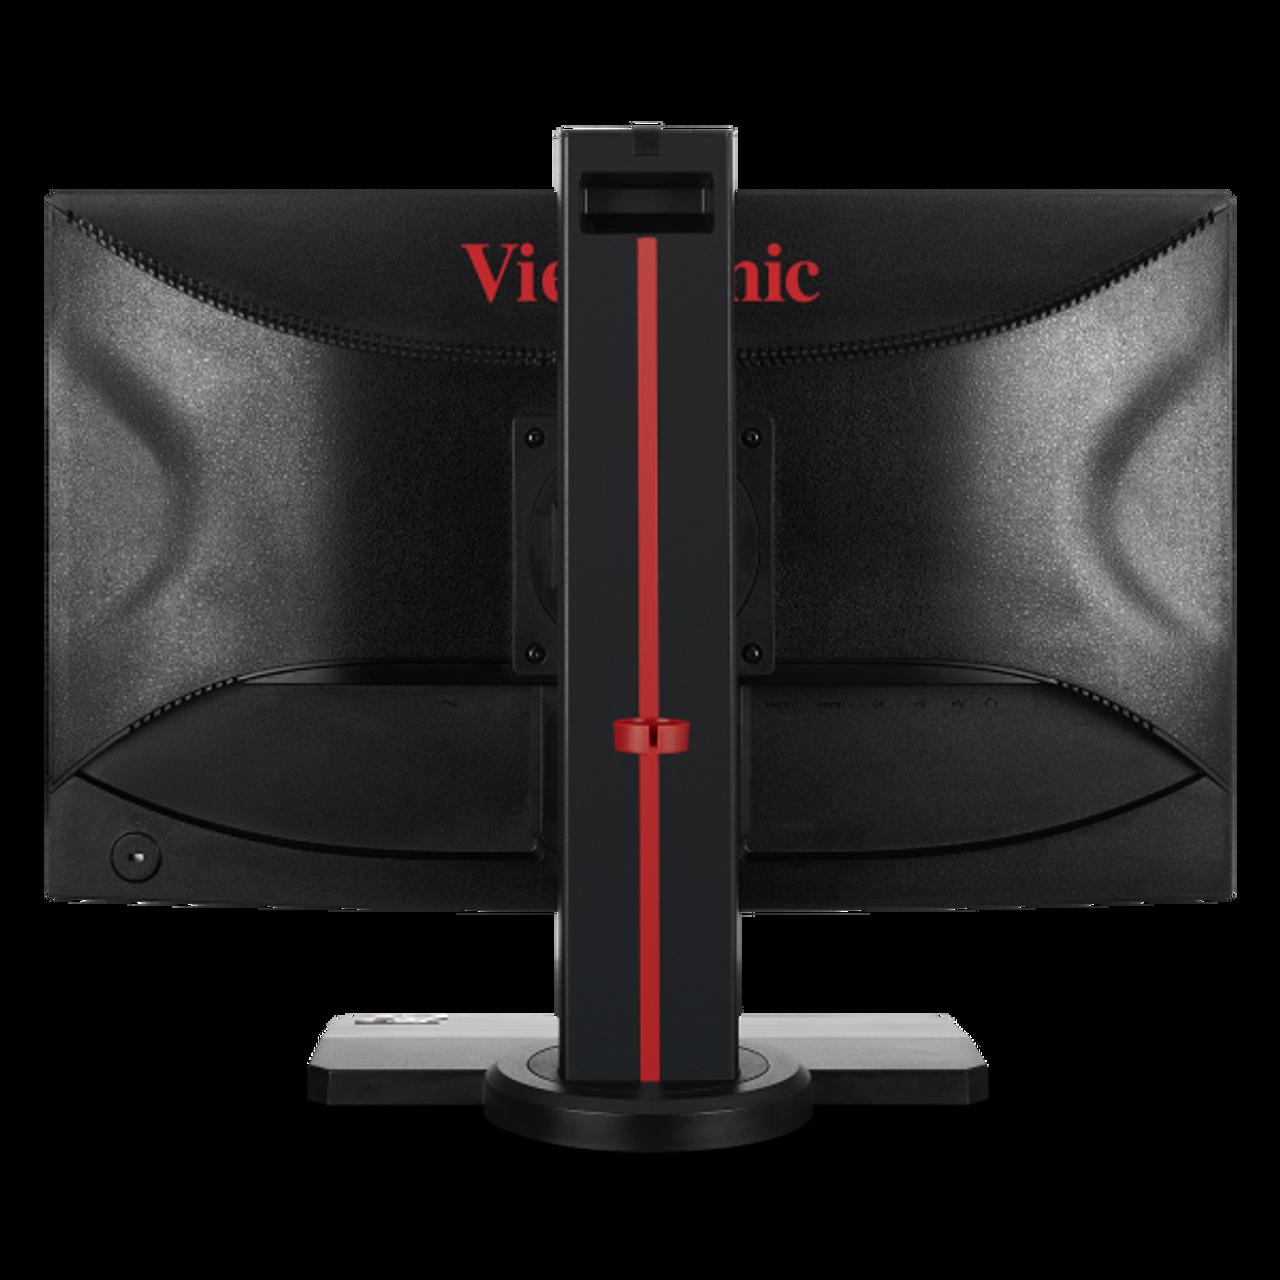 "ViewSonic XG2530-R 25"" Gaming Monitor with FreeSync Eye Care Advanced Ergonomics - C Grade Refurbished"